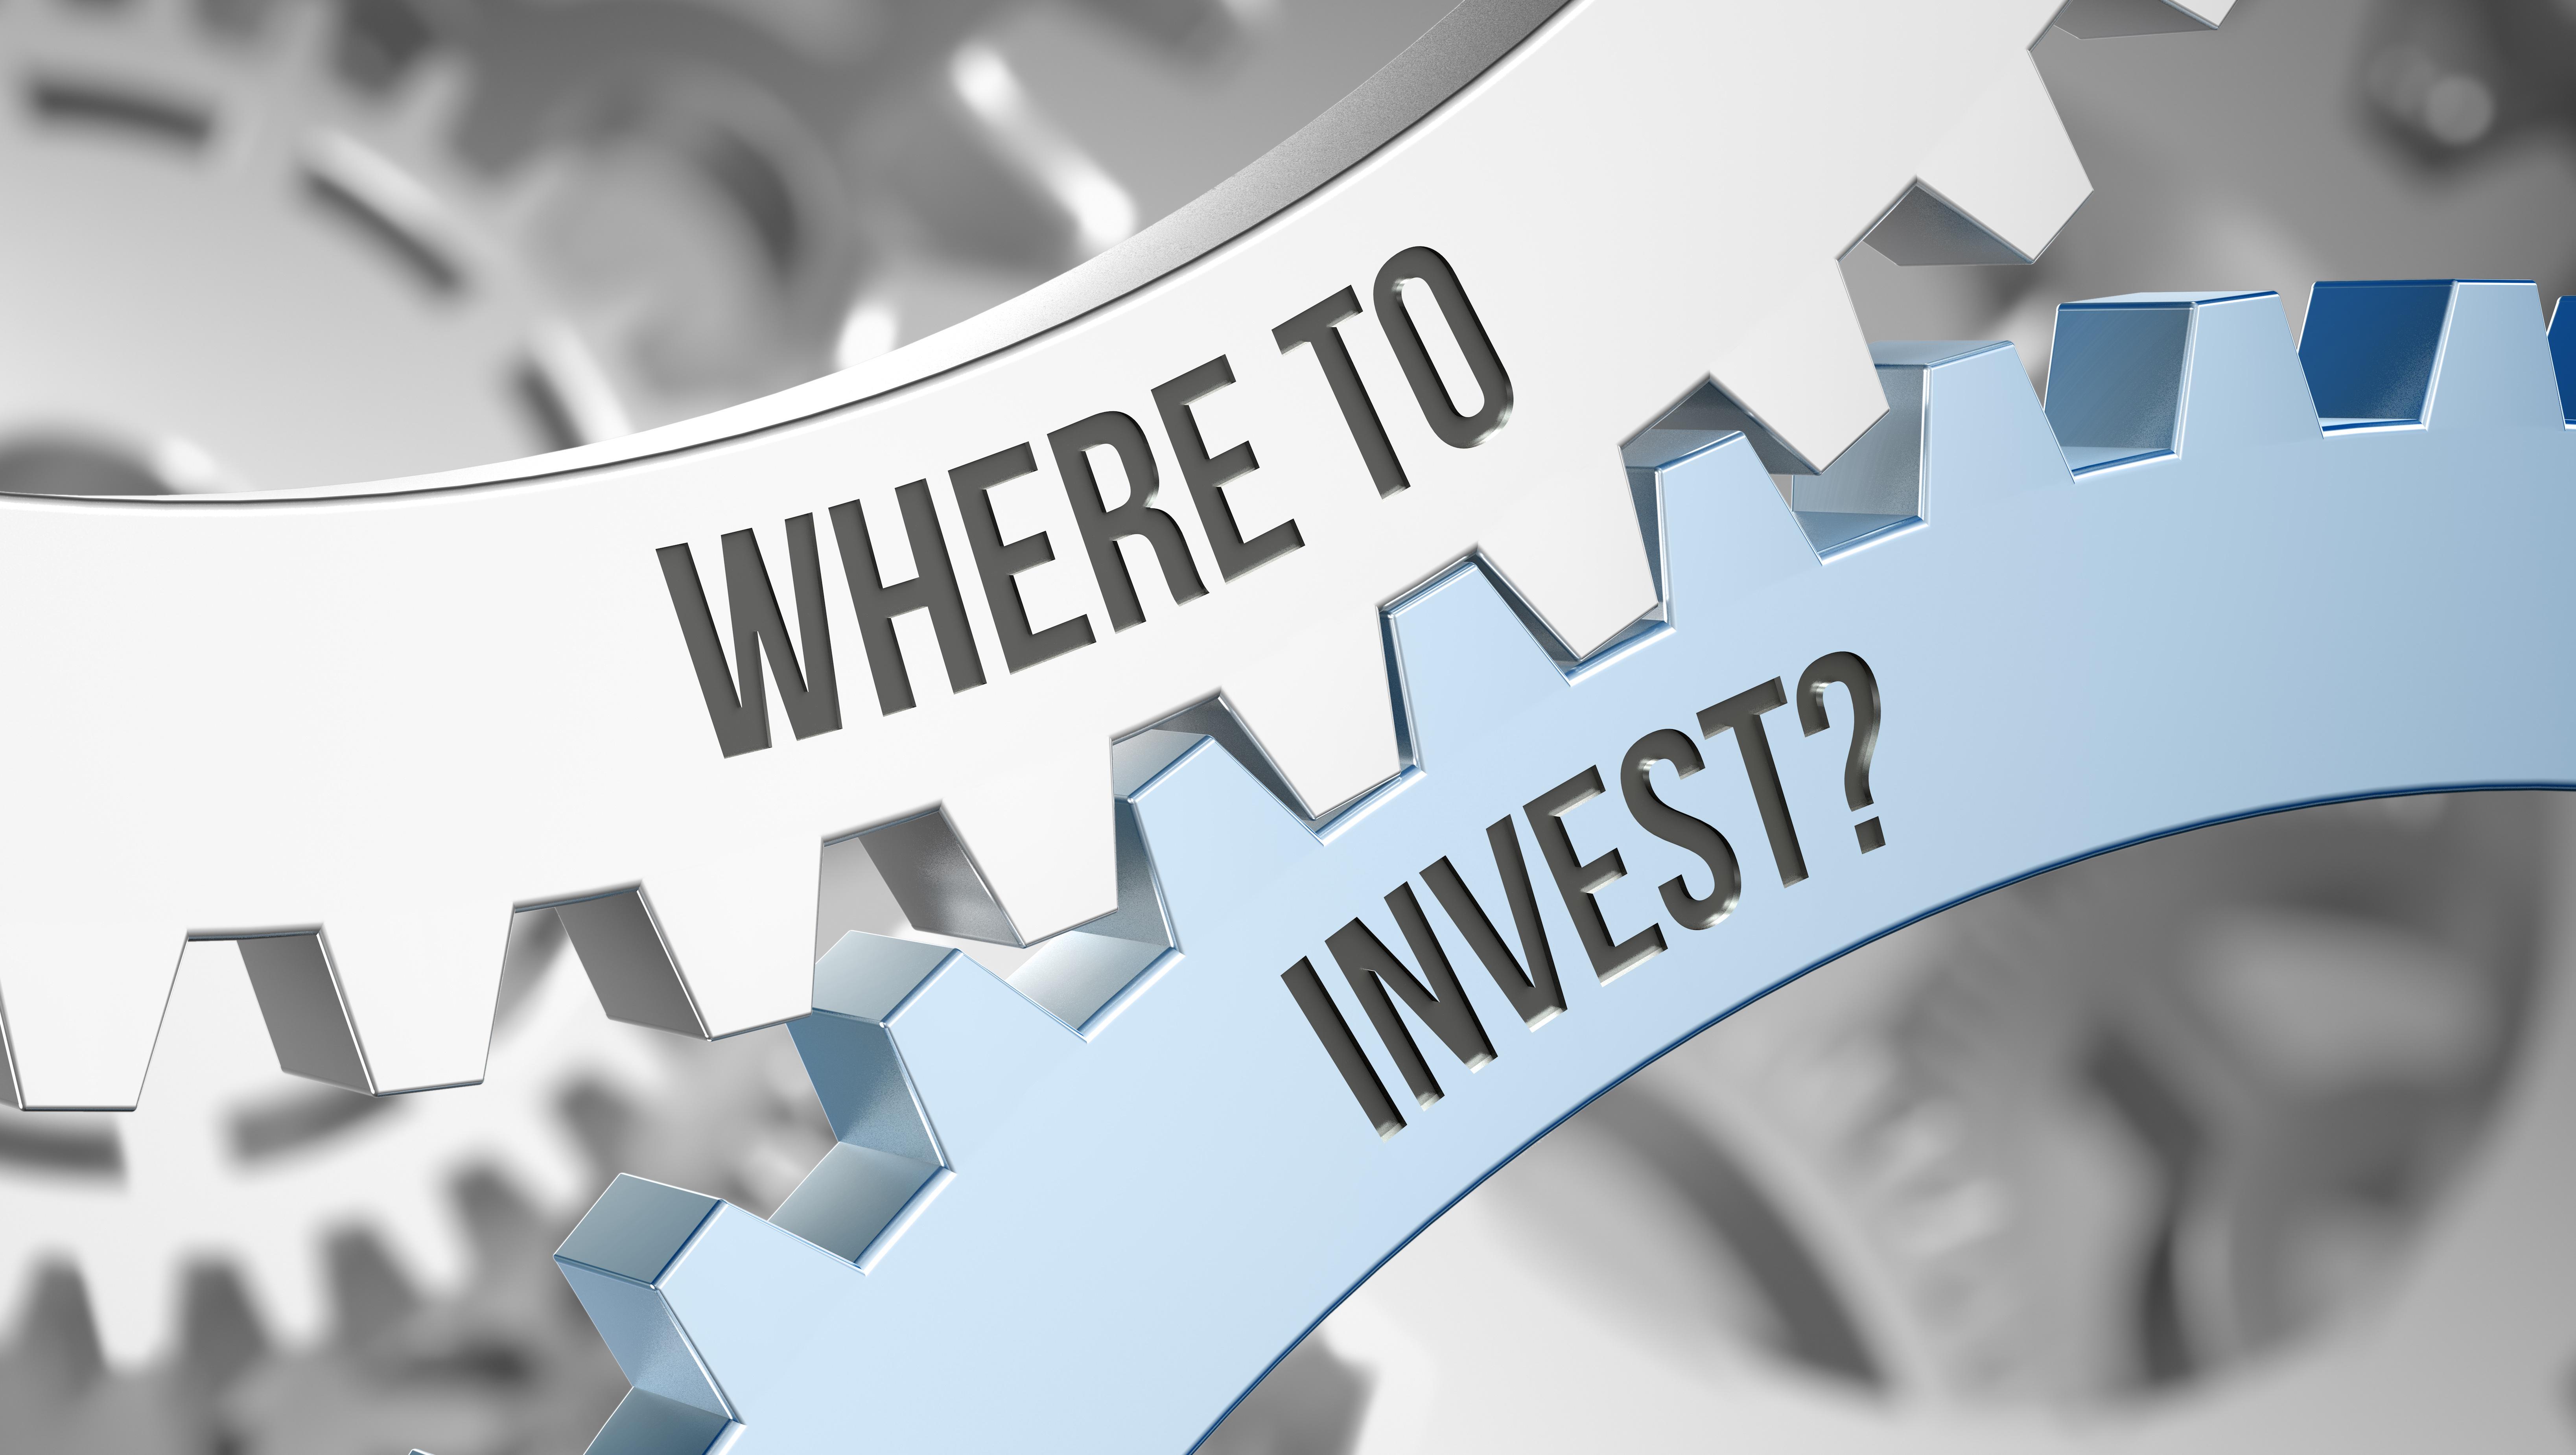 Prospective Investors, Where to Invest?